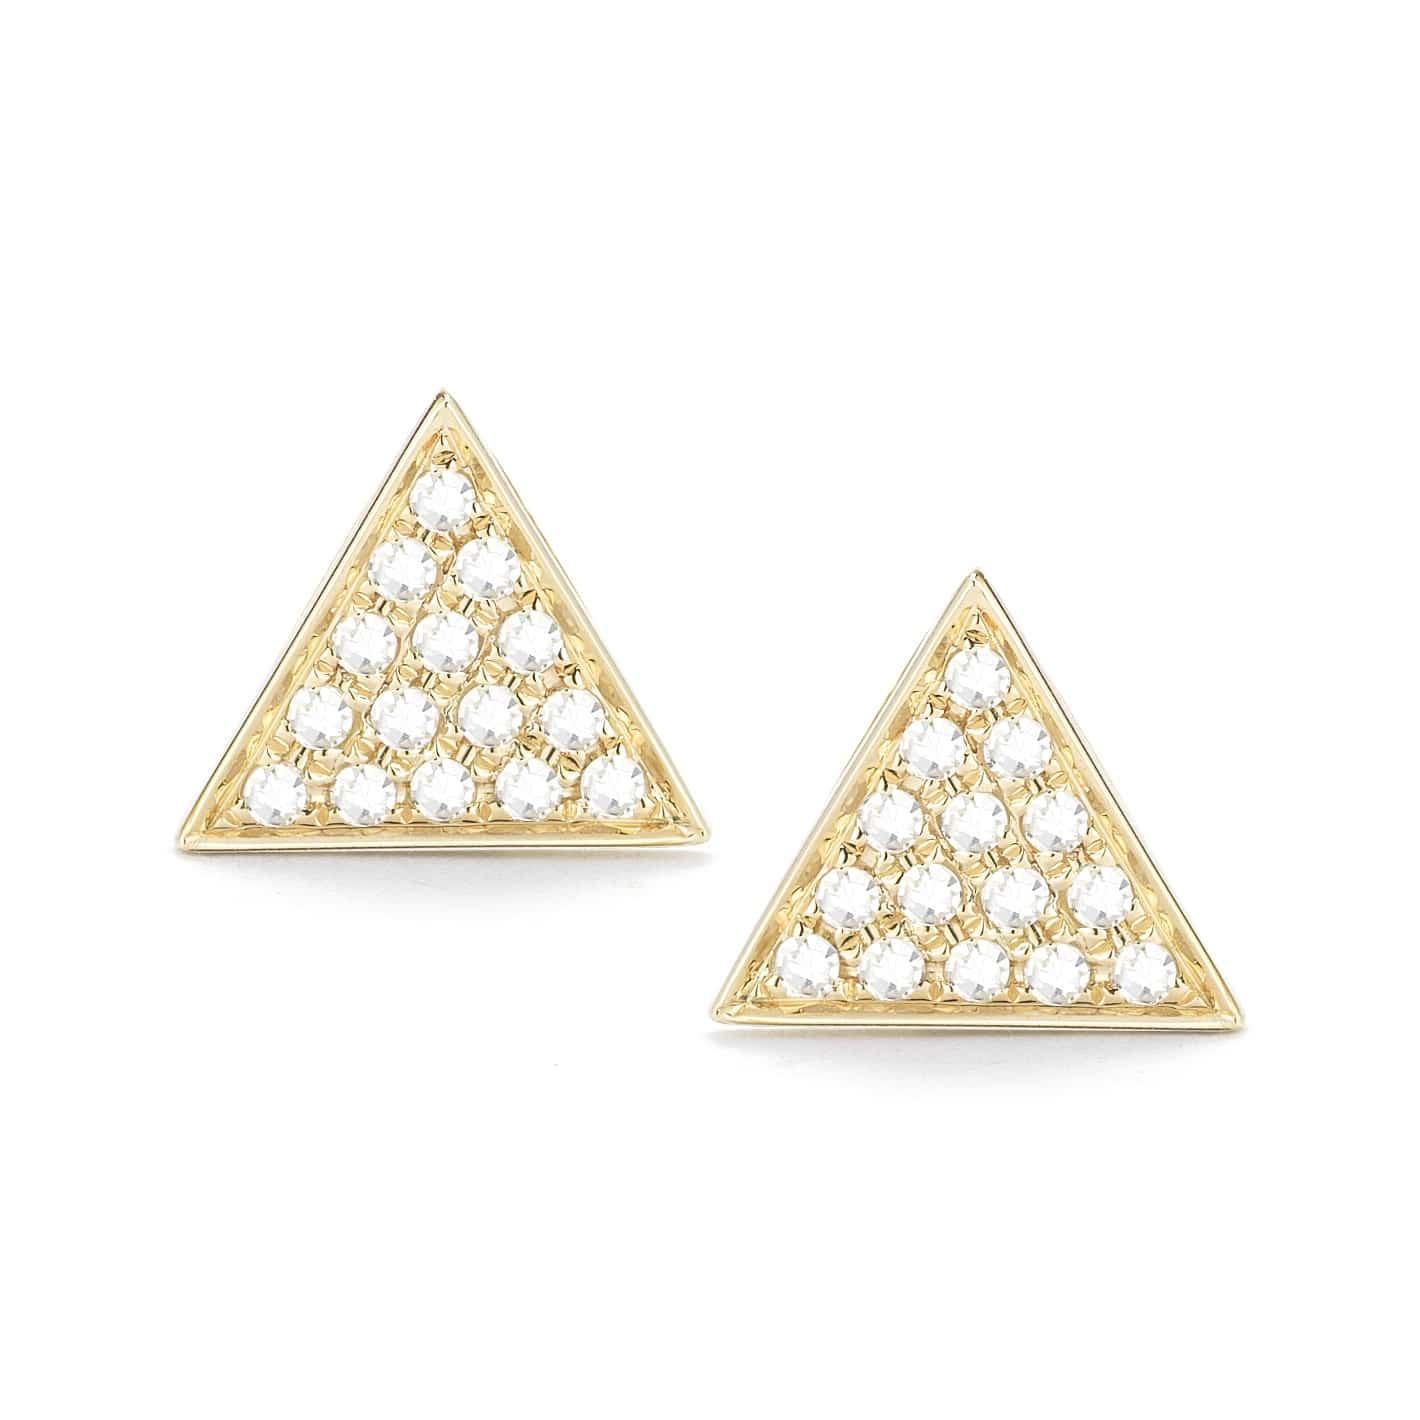 Dana Rebecca Emily Sarah Yellow Gold Triangle Stud